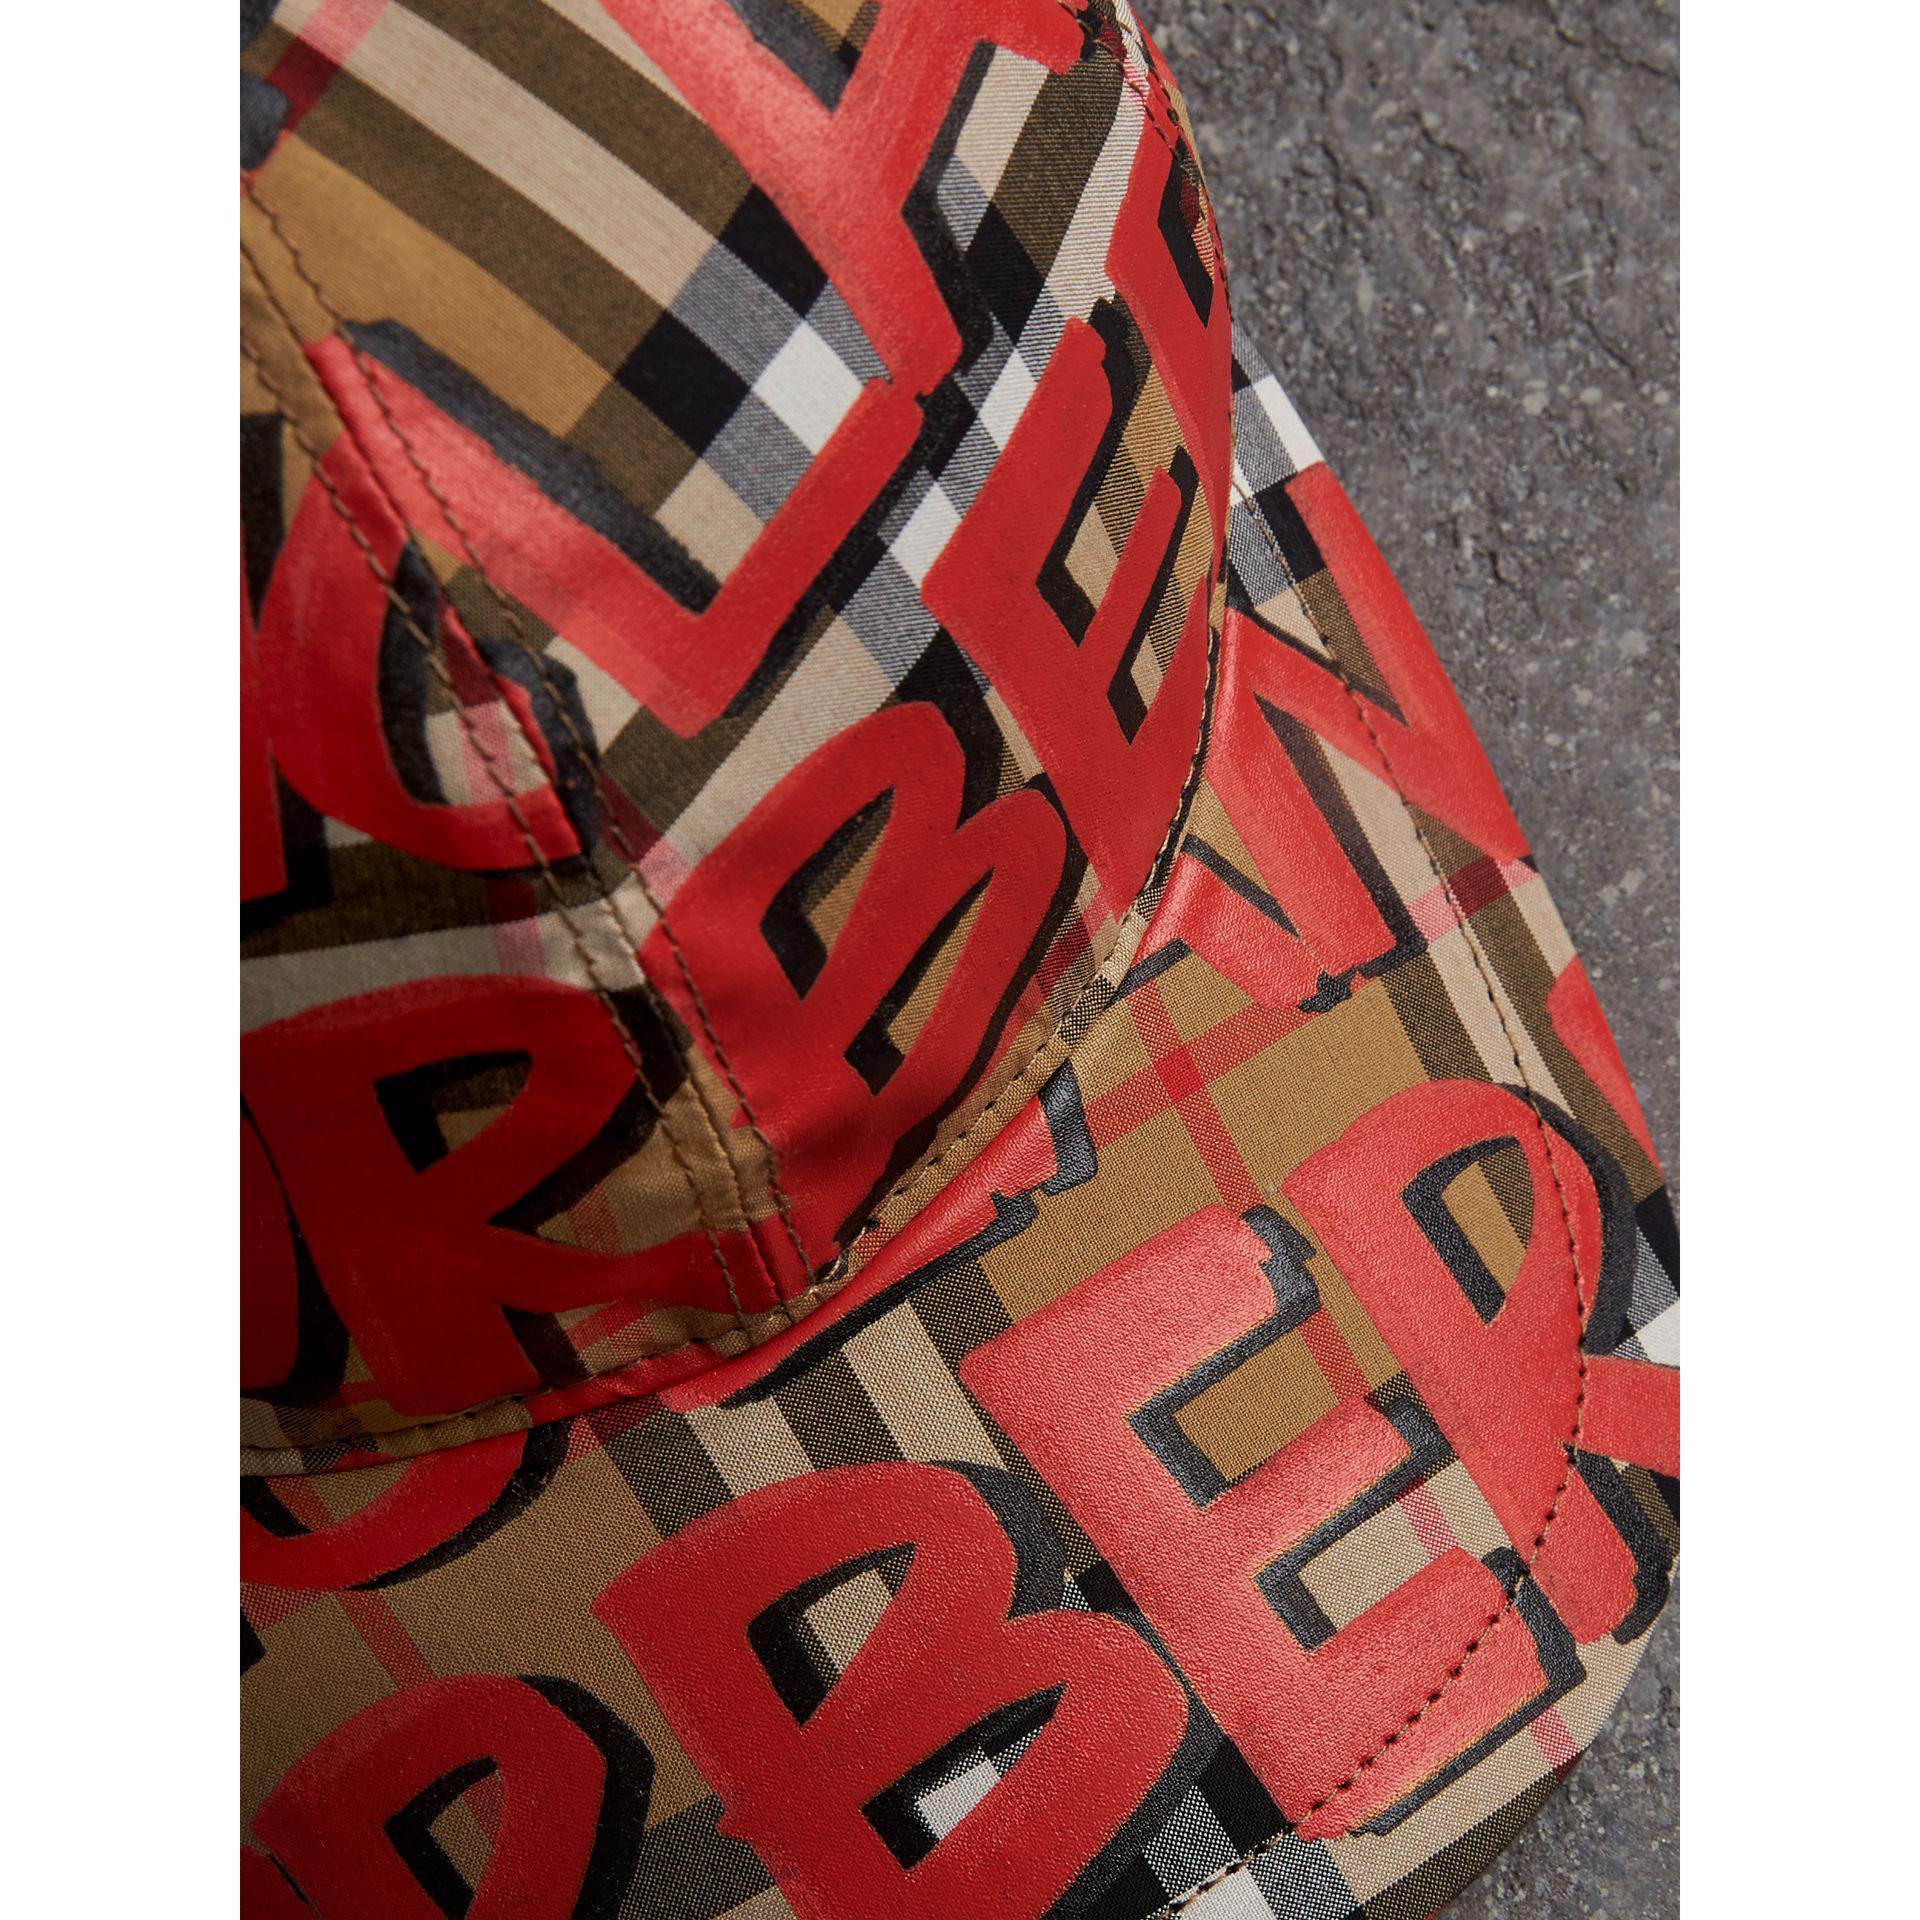 102ac82b97b Lyst - Burberry Graffiti Print Vintage Check Baseball Cap in Red